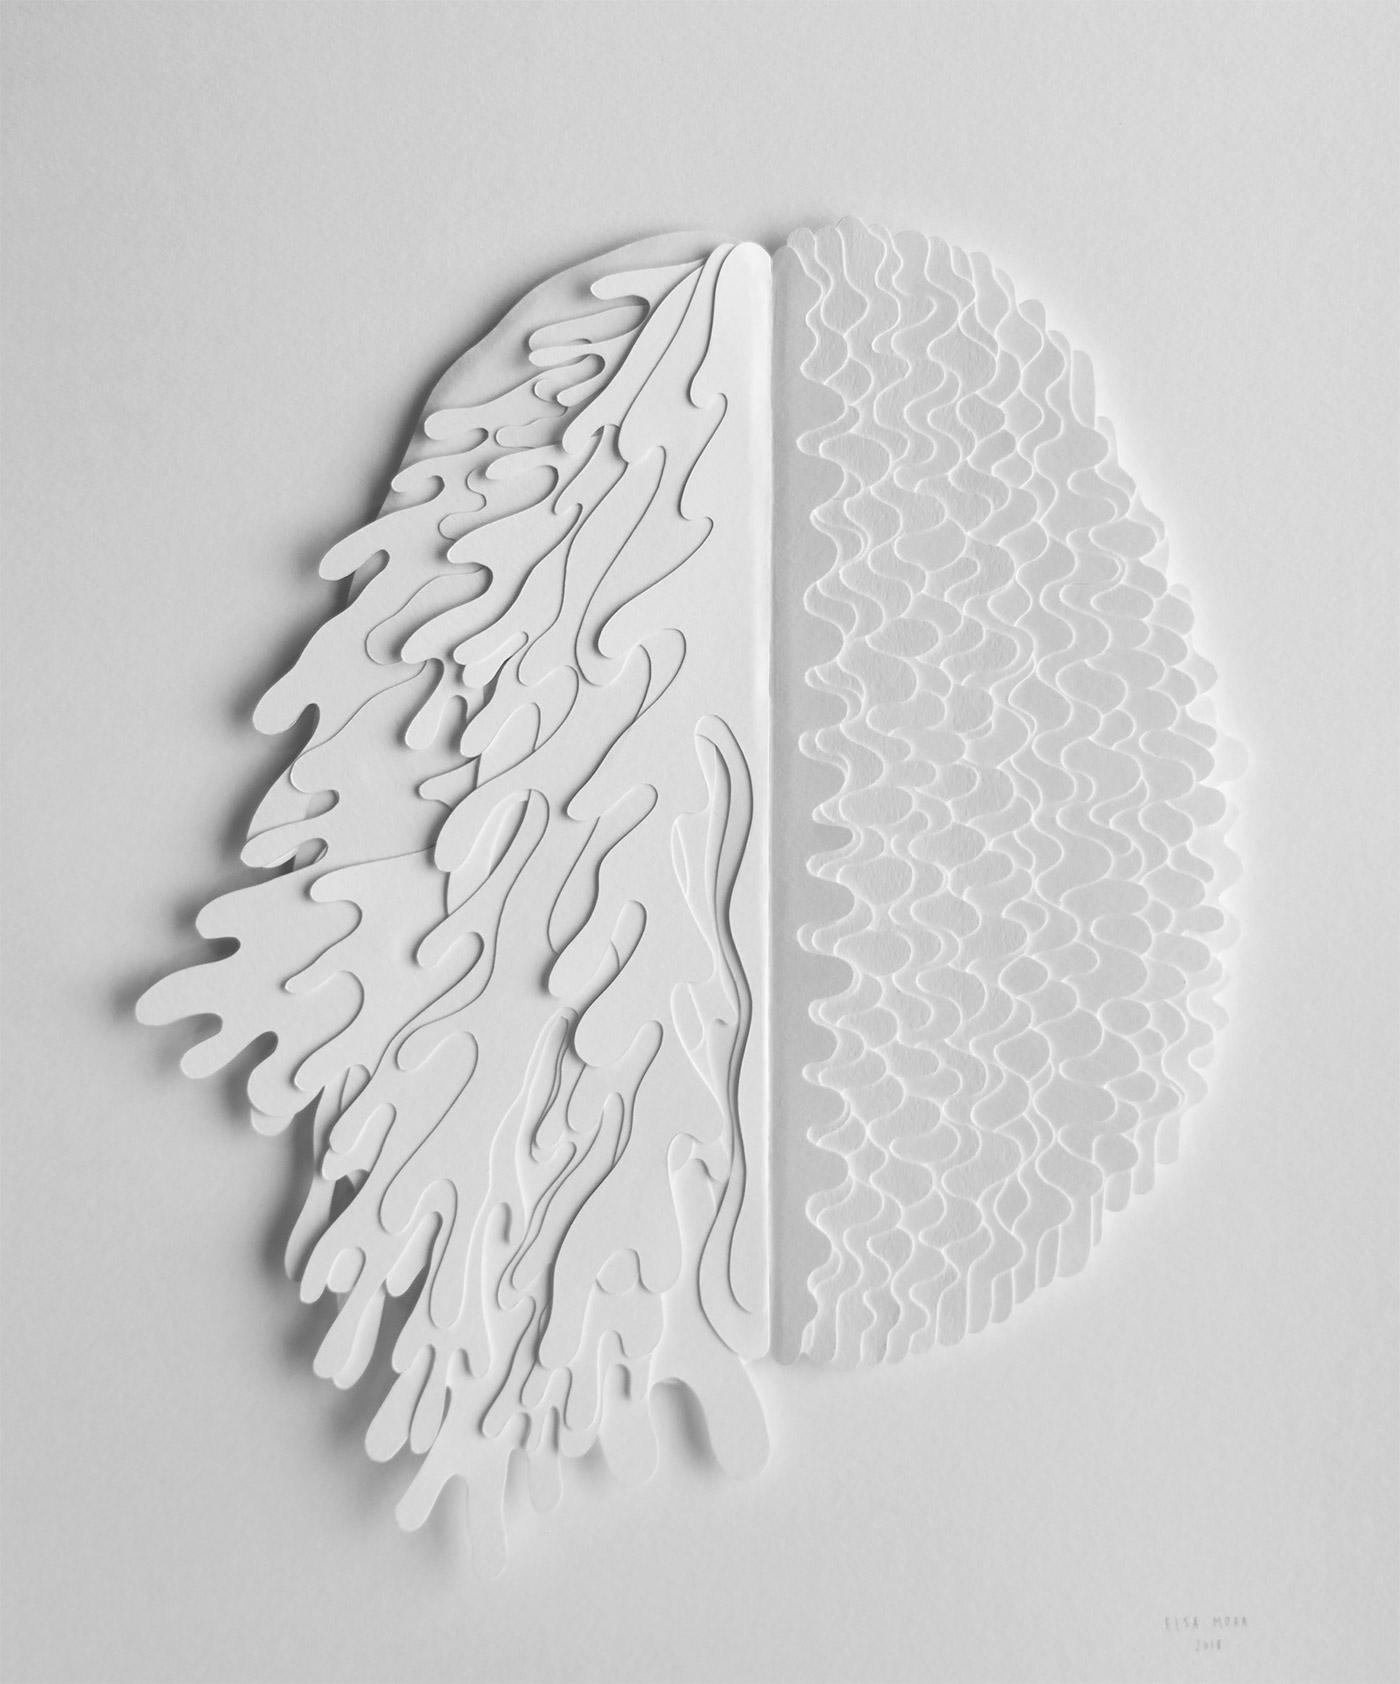 art-paper-elsa-mora-14.jpg